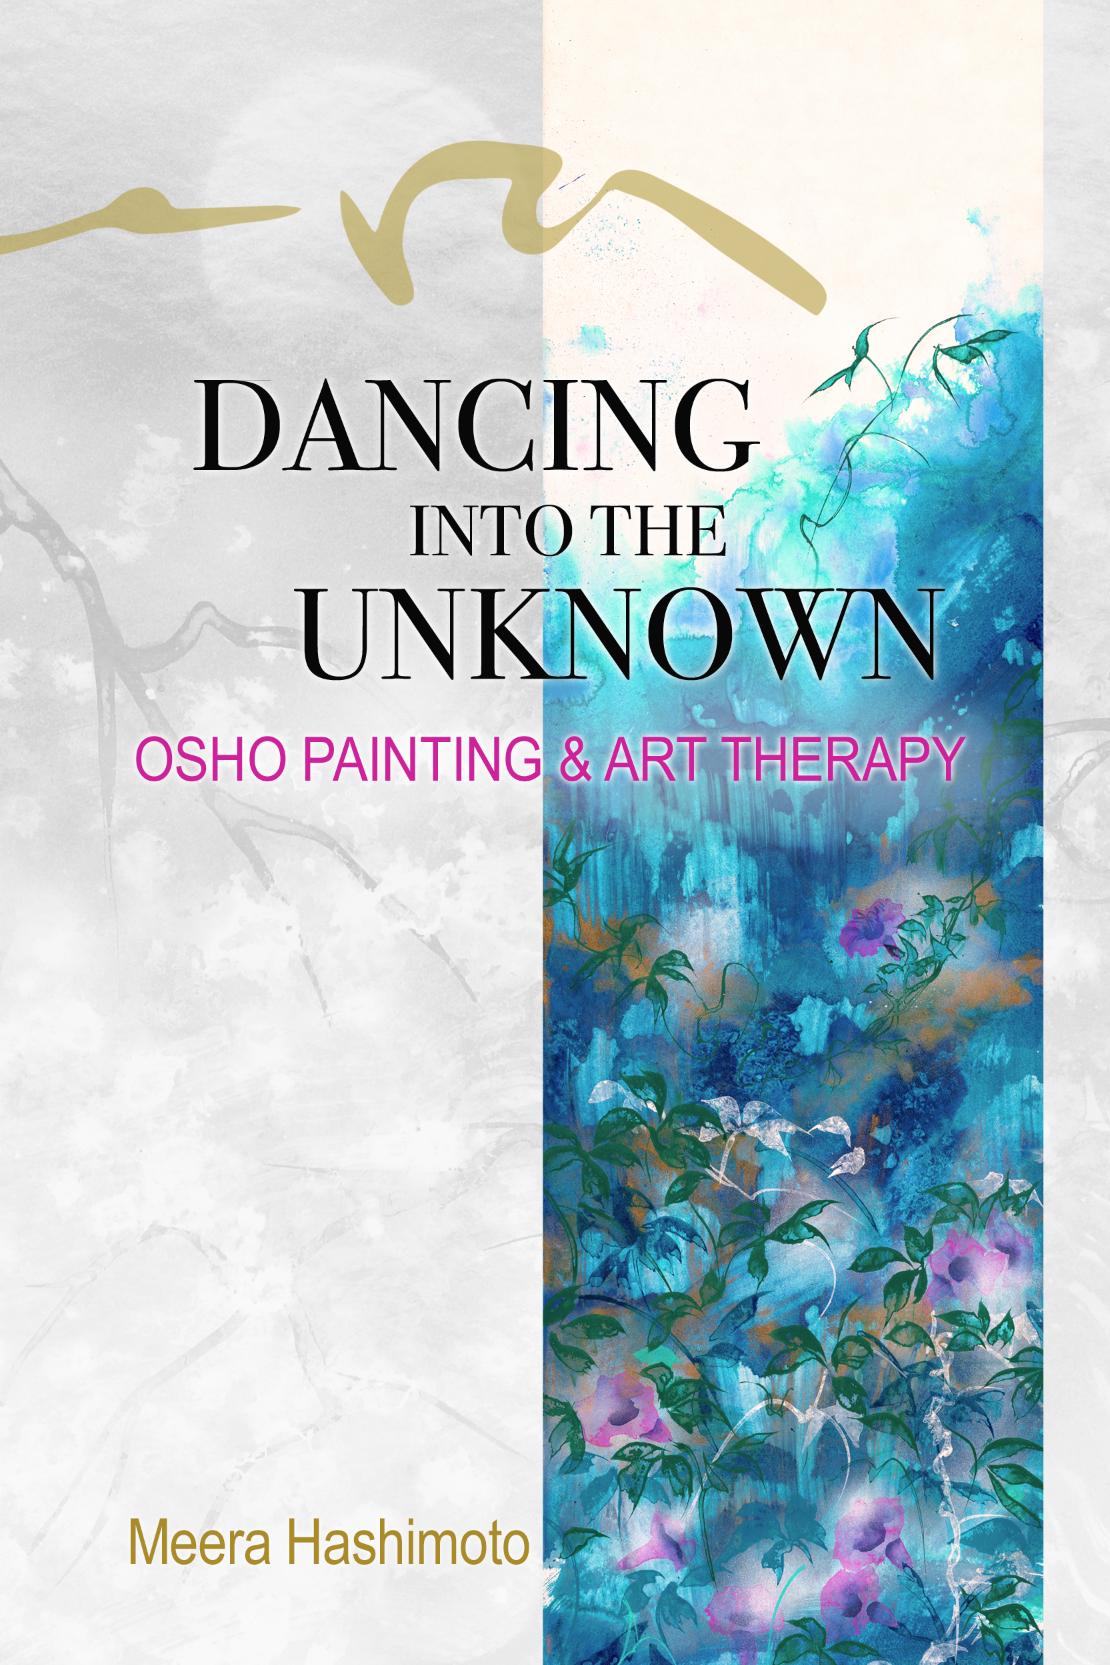 Dancing into the Unknown - この本は、これらの3つの手段によって真のアイデンティティを求めている人々のために、アート、セラピー、瞑想を一緒に探求したい人のための機会です